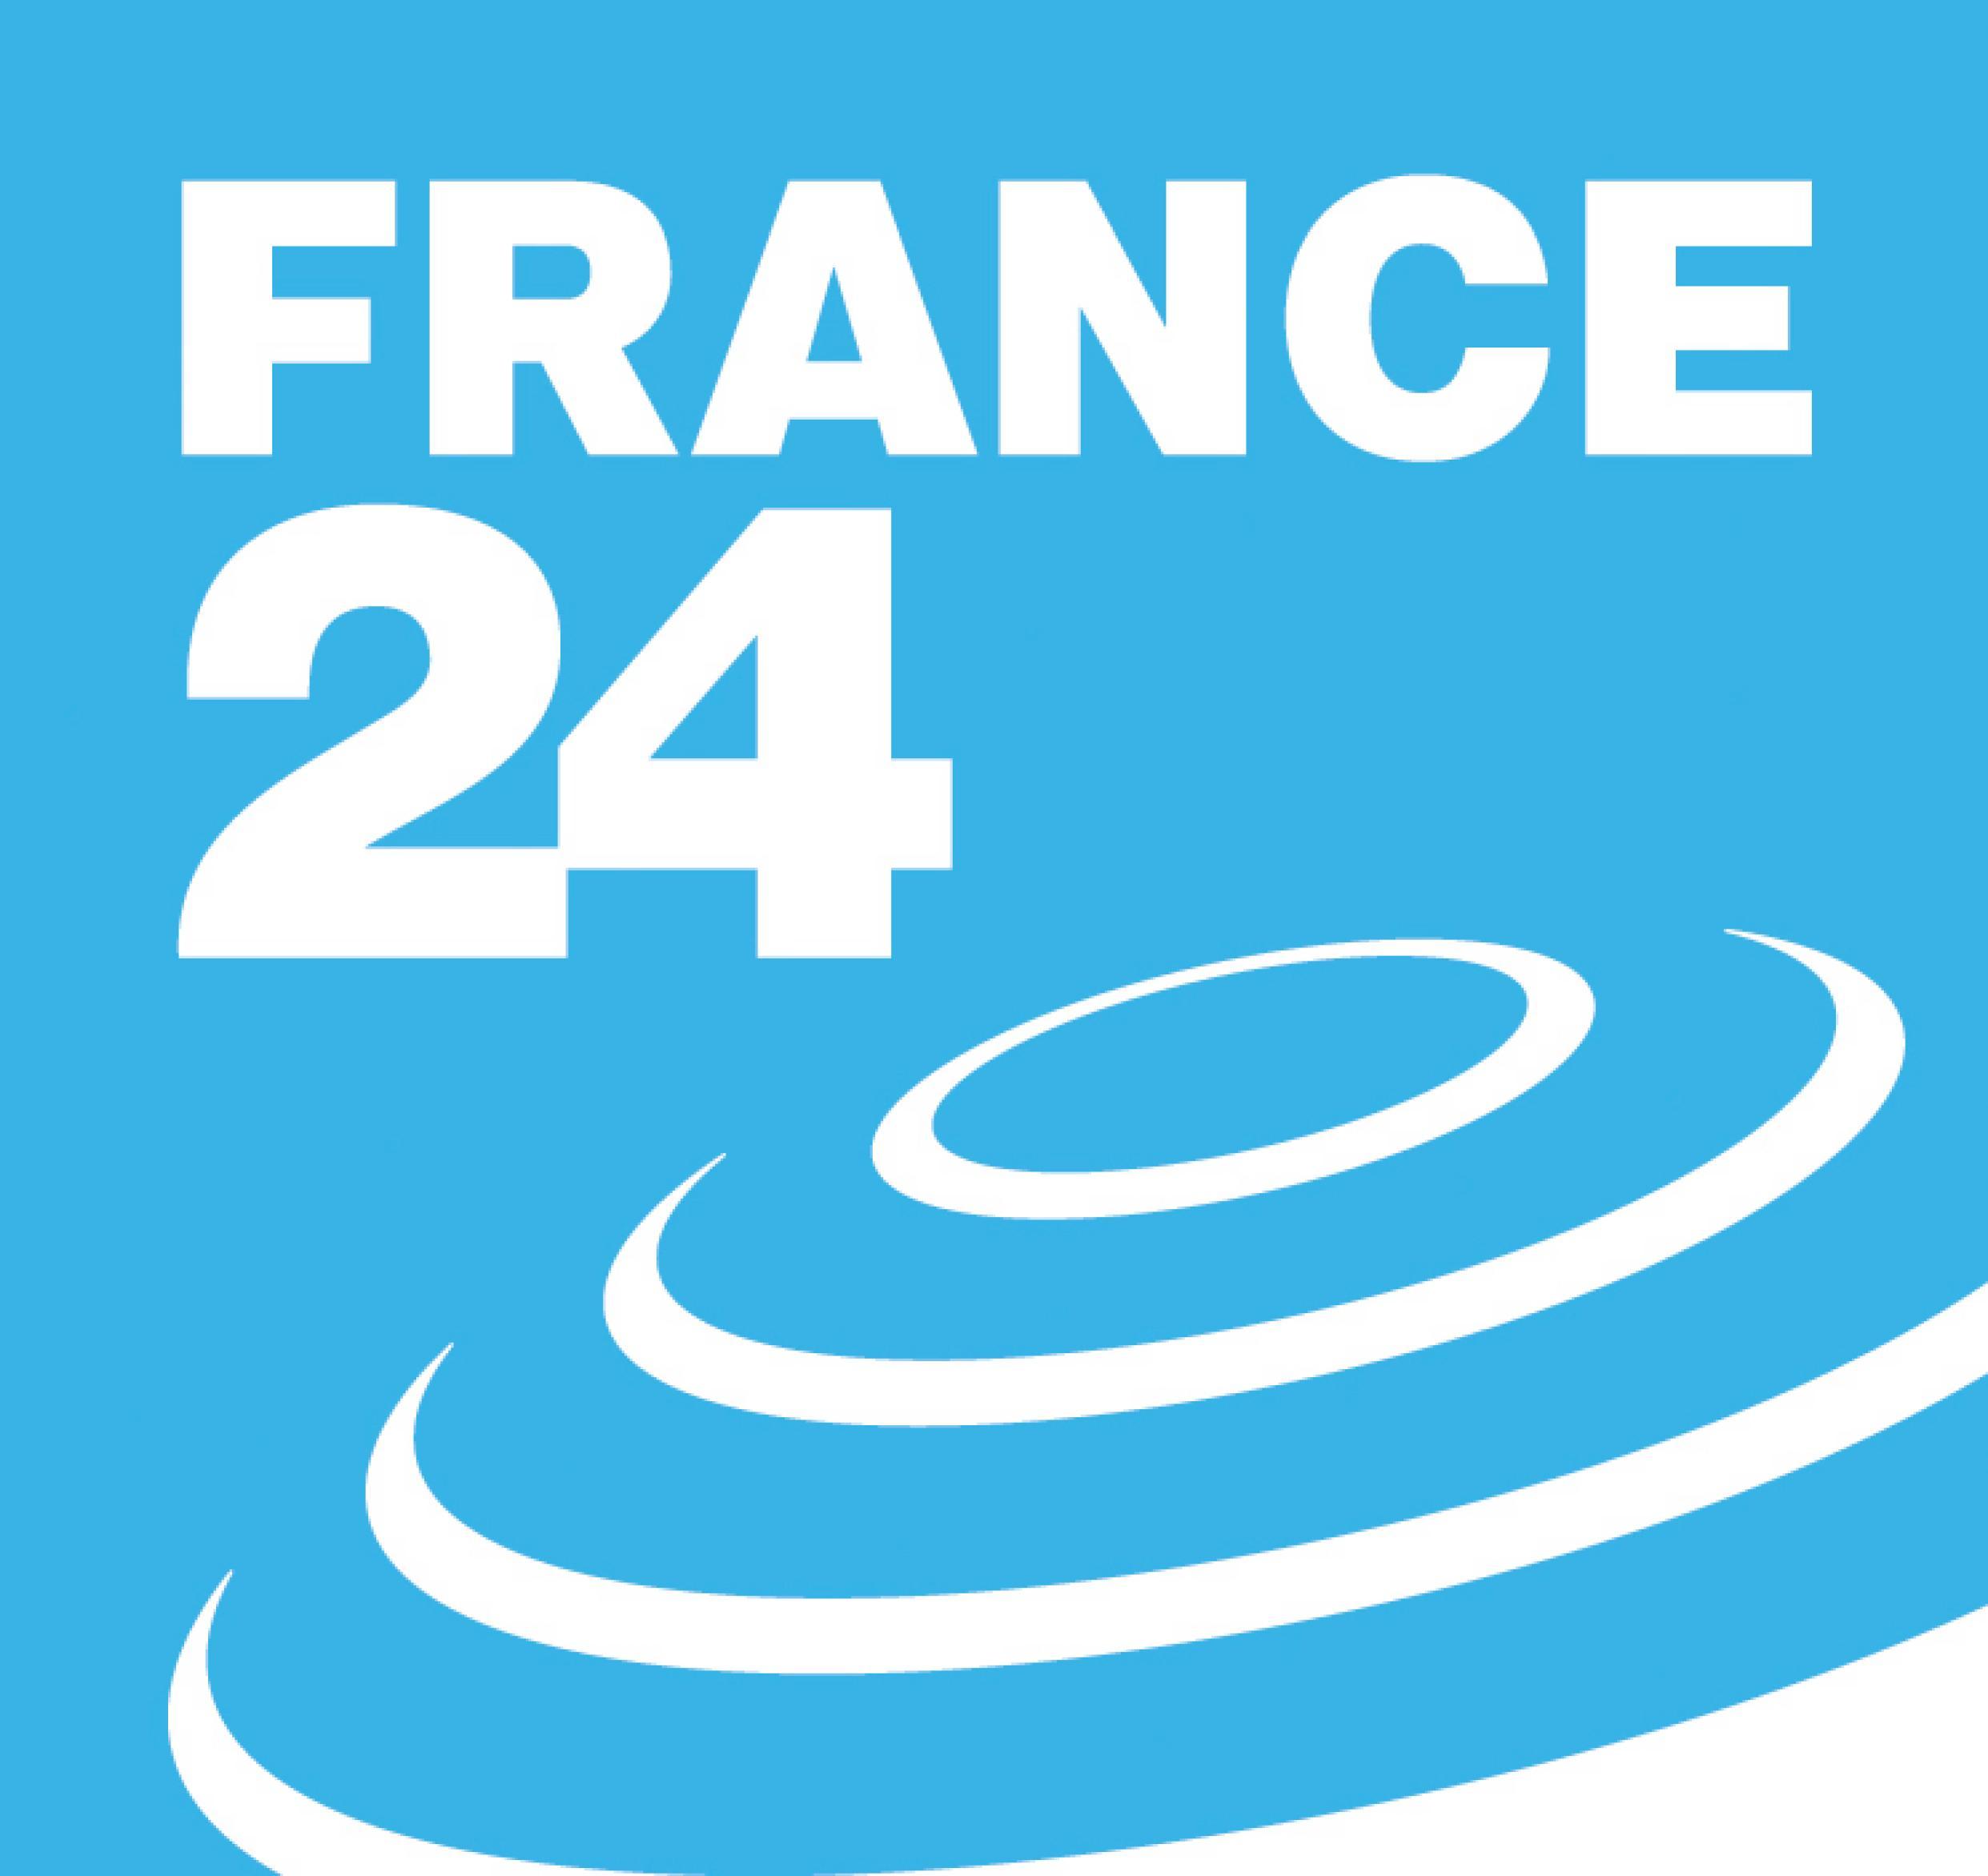 france_24 logo